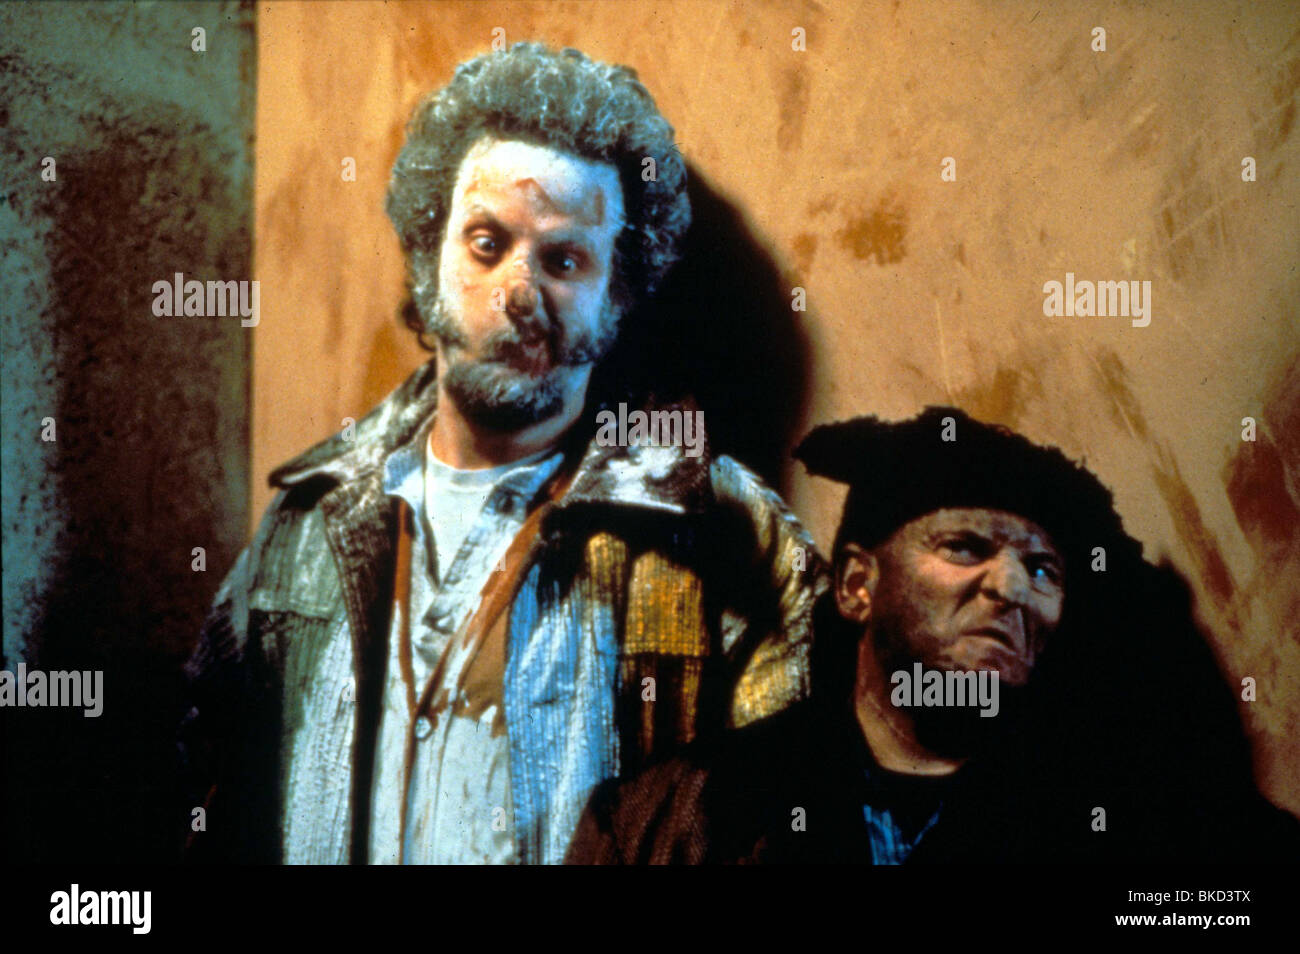 Home Alone 2 Lost In New York 1992 Daniel Stern Joe Pesci Hm2 040 Stock Photo Alamy